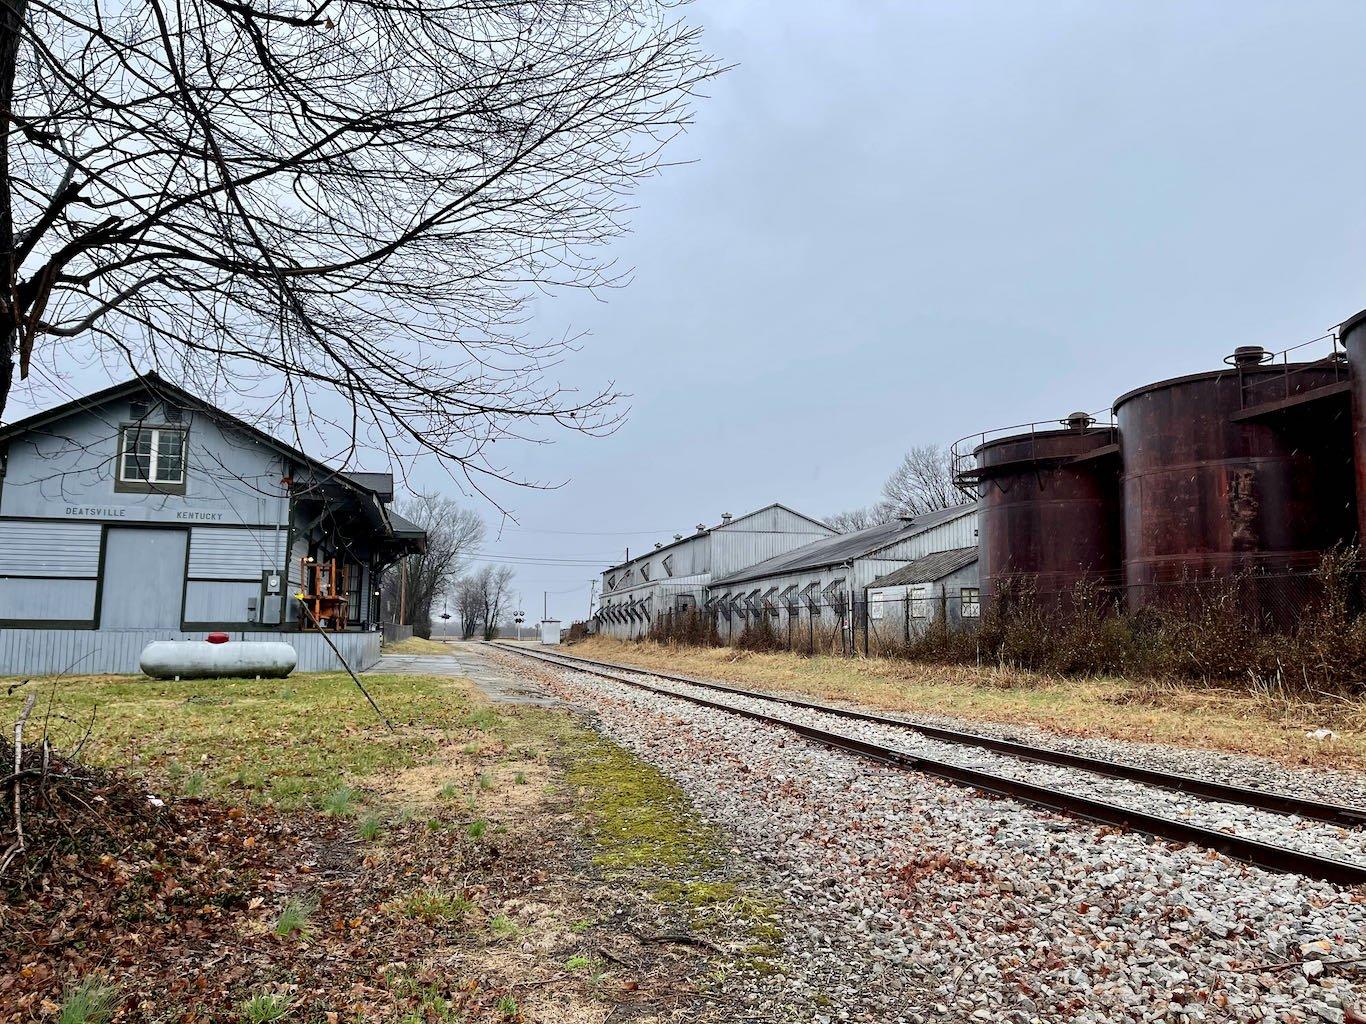 Train Depot and Outside Fermenters - Old Samuels Distillery